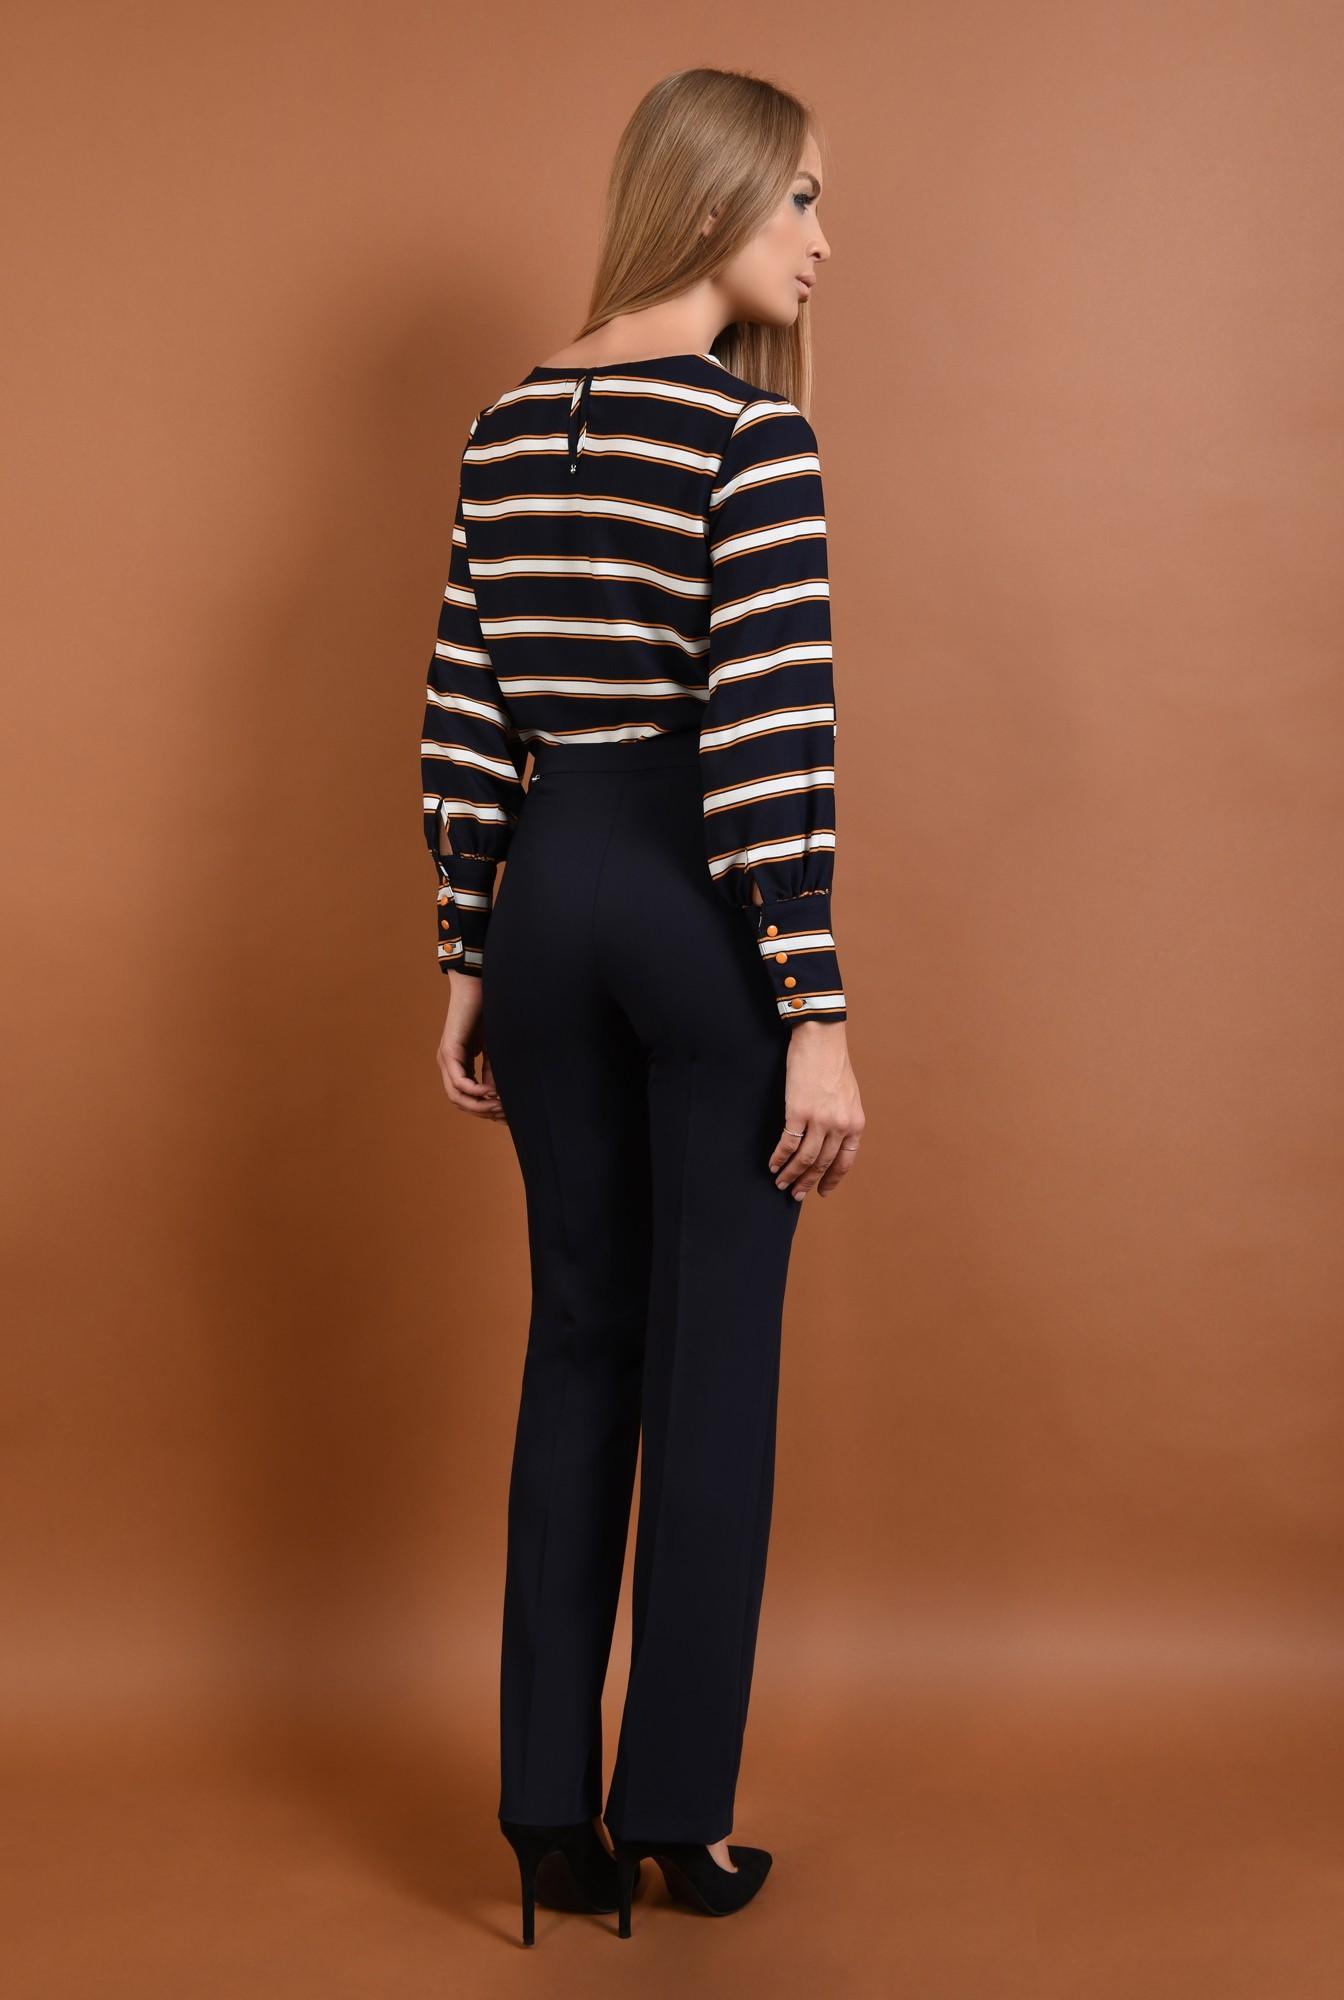 1 - 360 - pantaloni pana, bleumarin, croi clasic, funda la talie